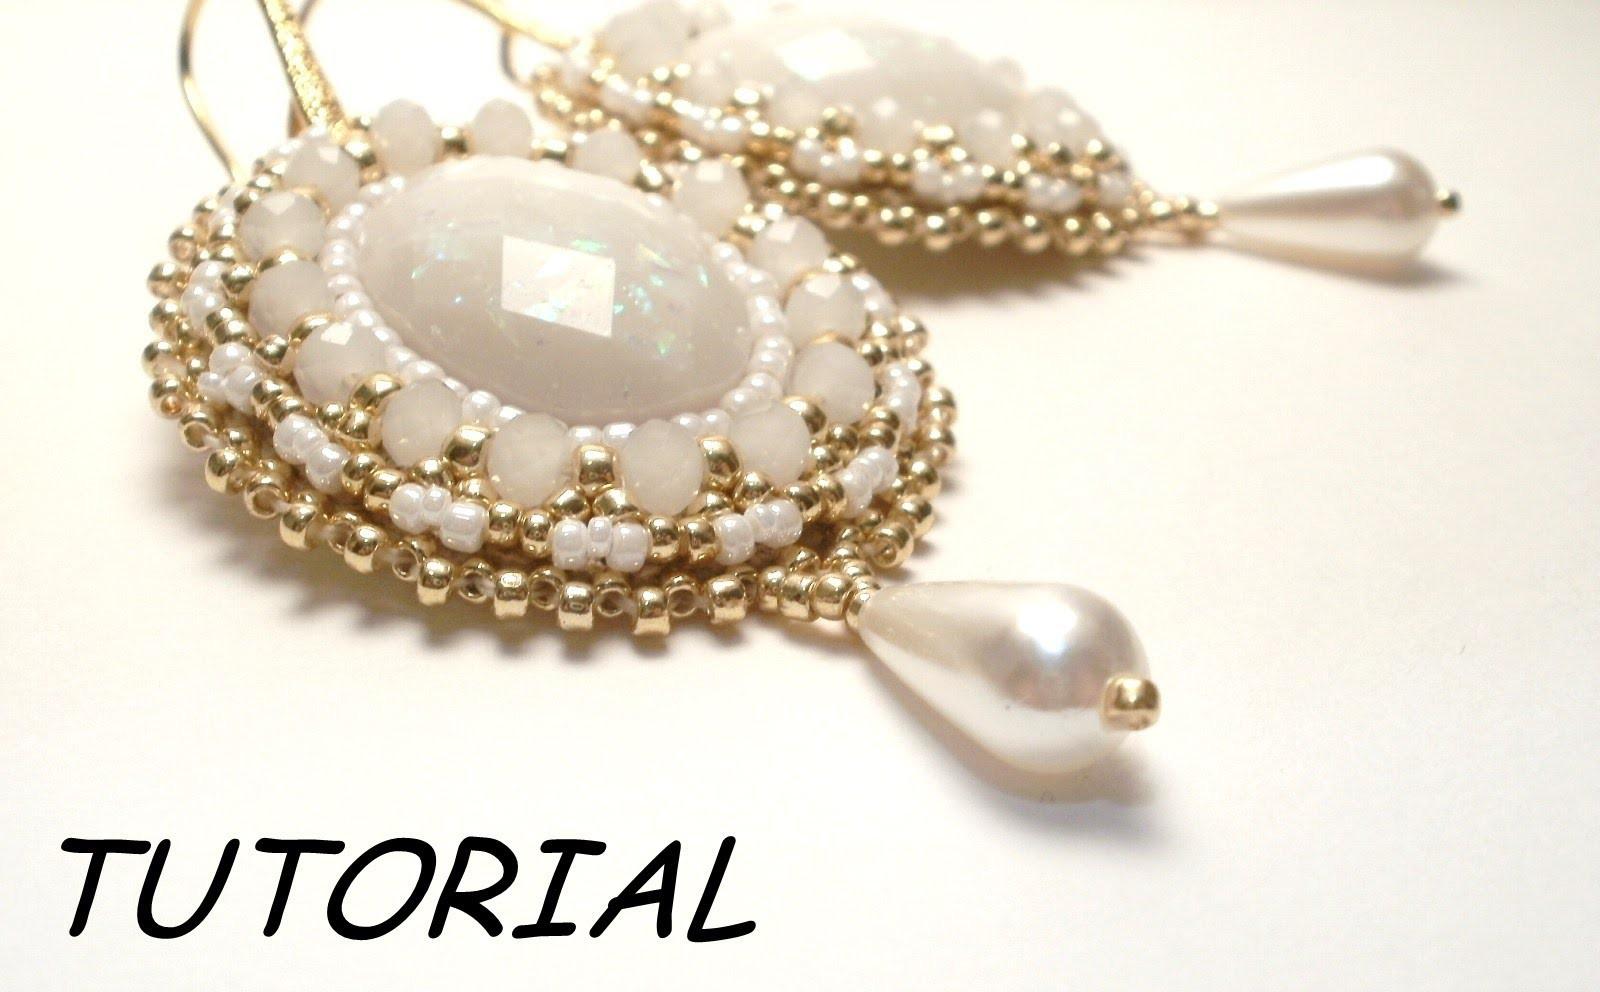 TUTORIAL orecchini embroidery | Bead embroidery TUTORIAL